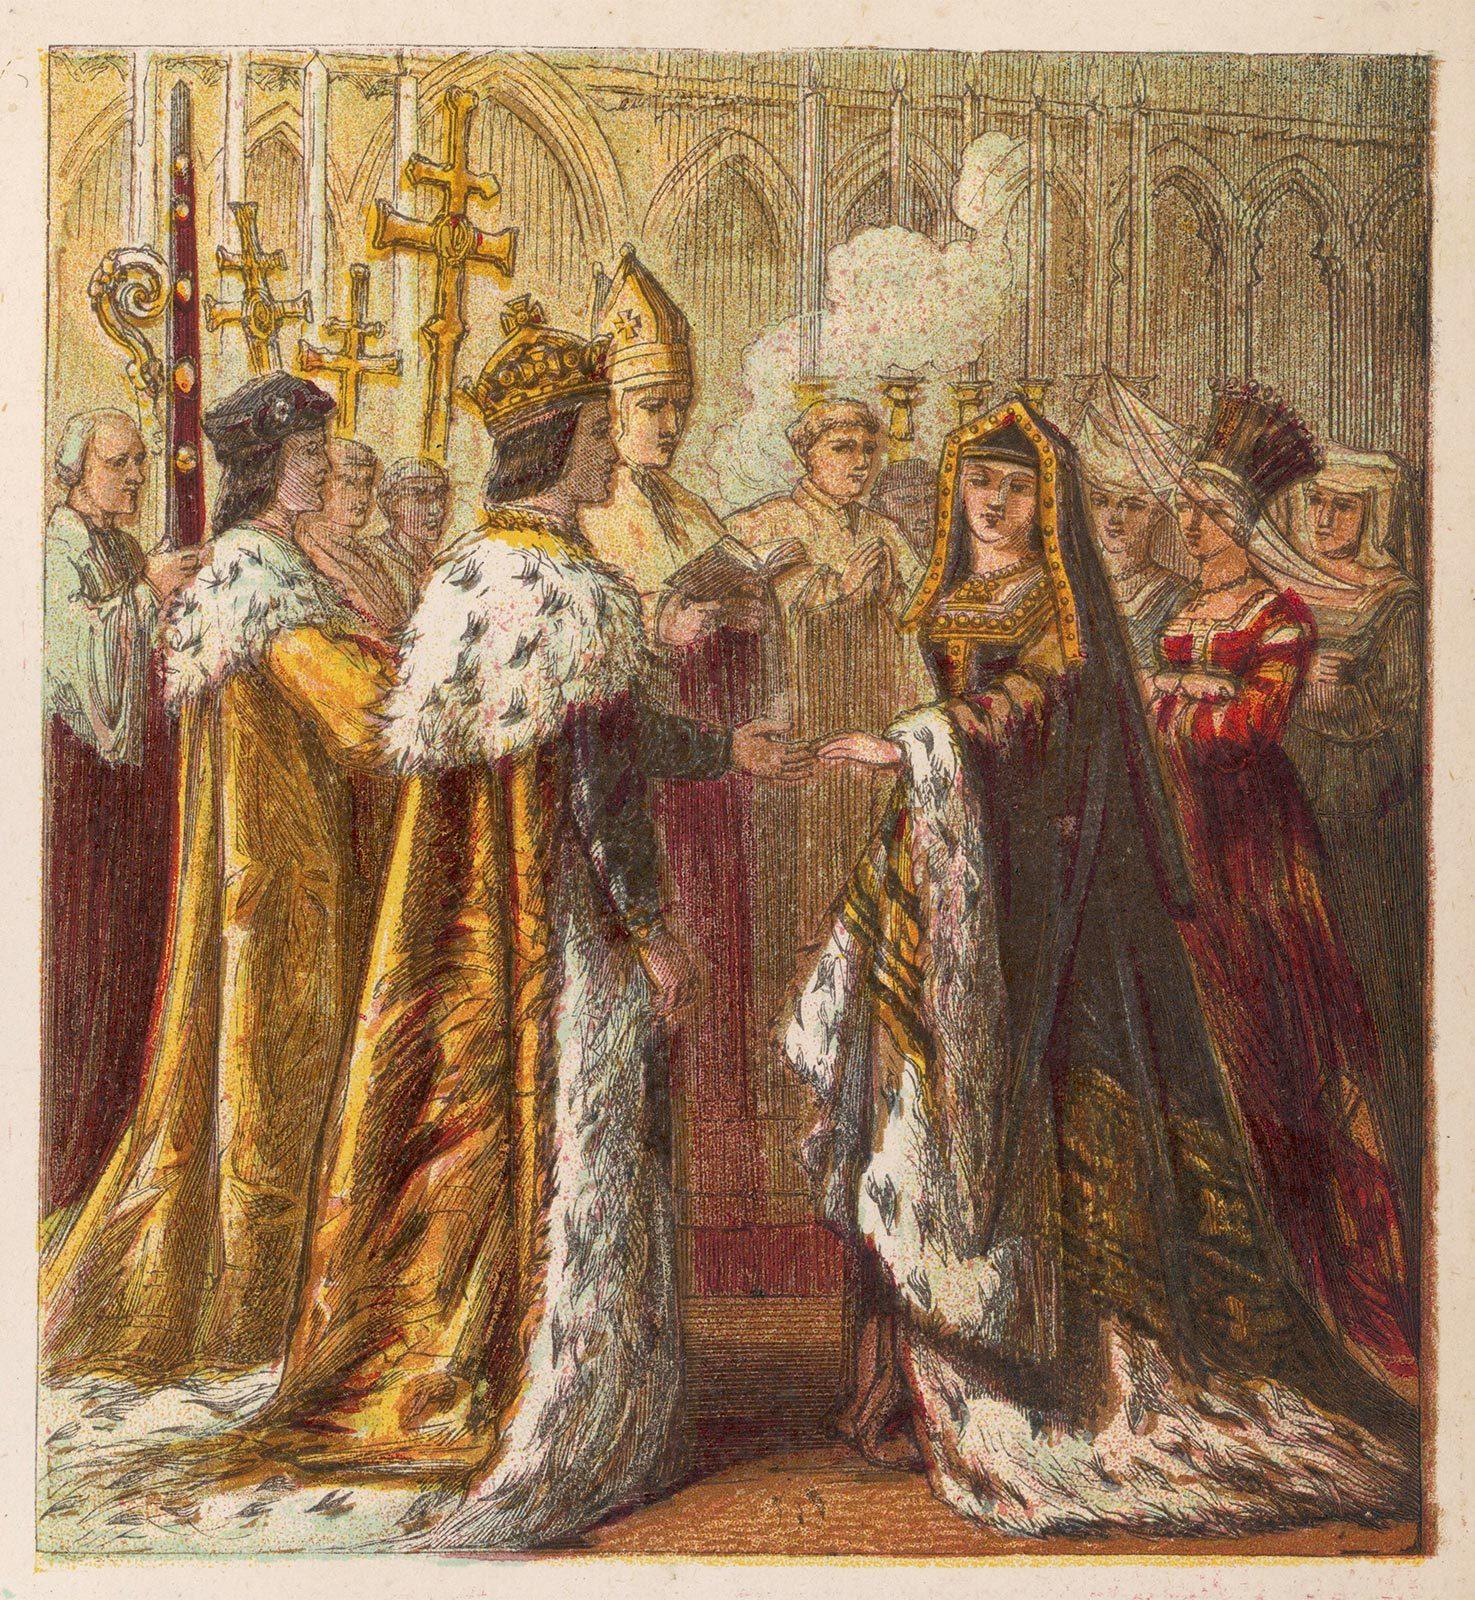 Henry VII and Elizabeth of York, 3rd cousins